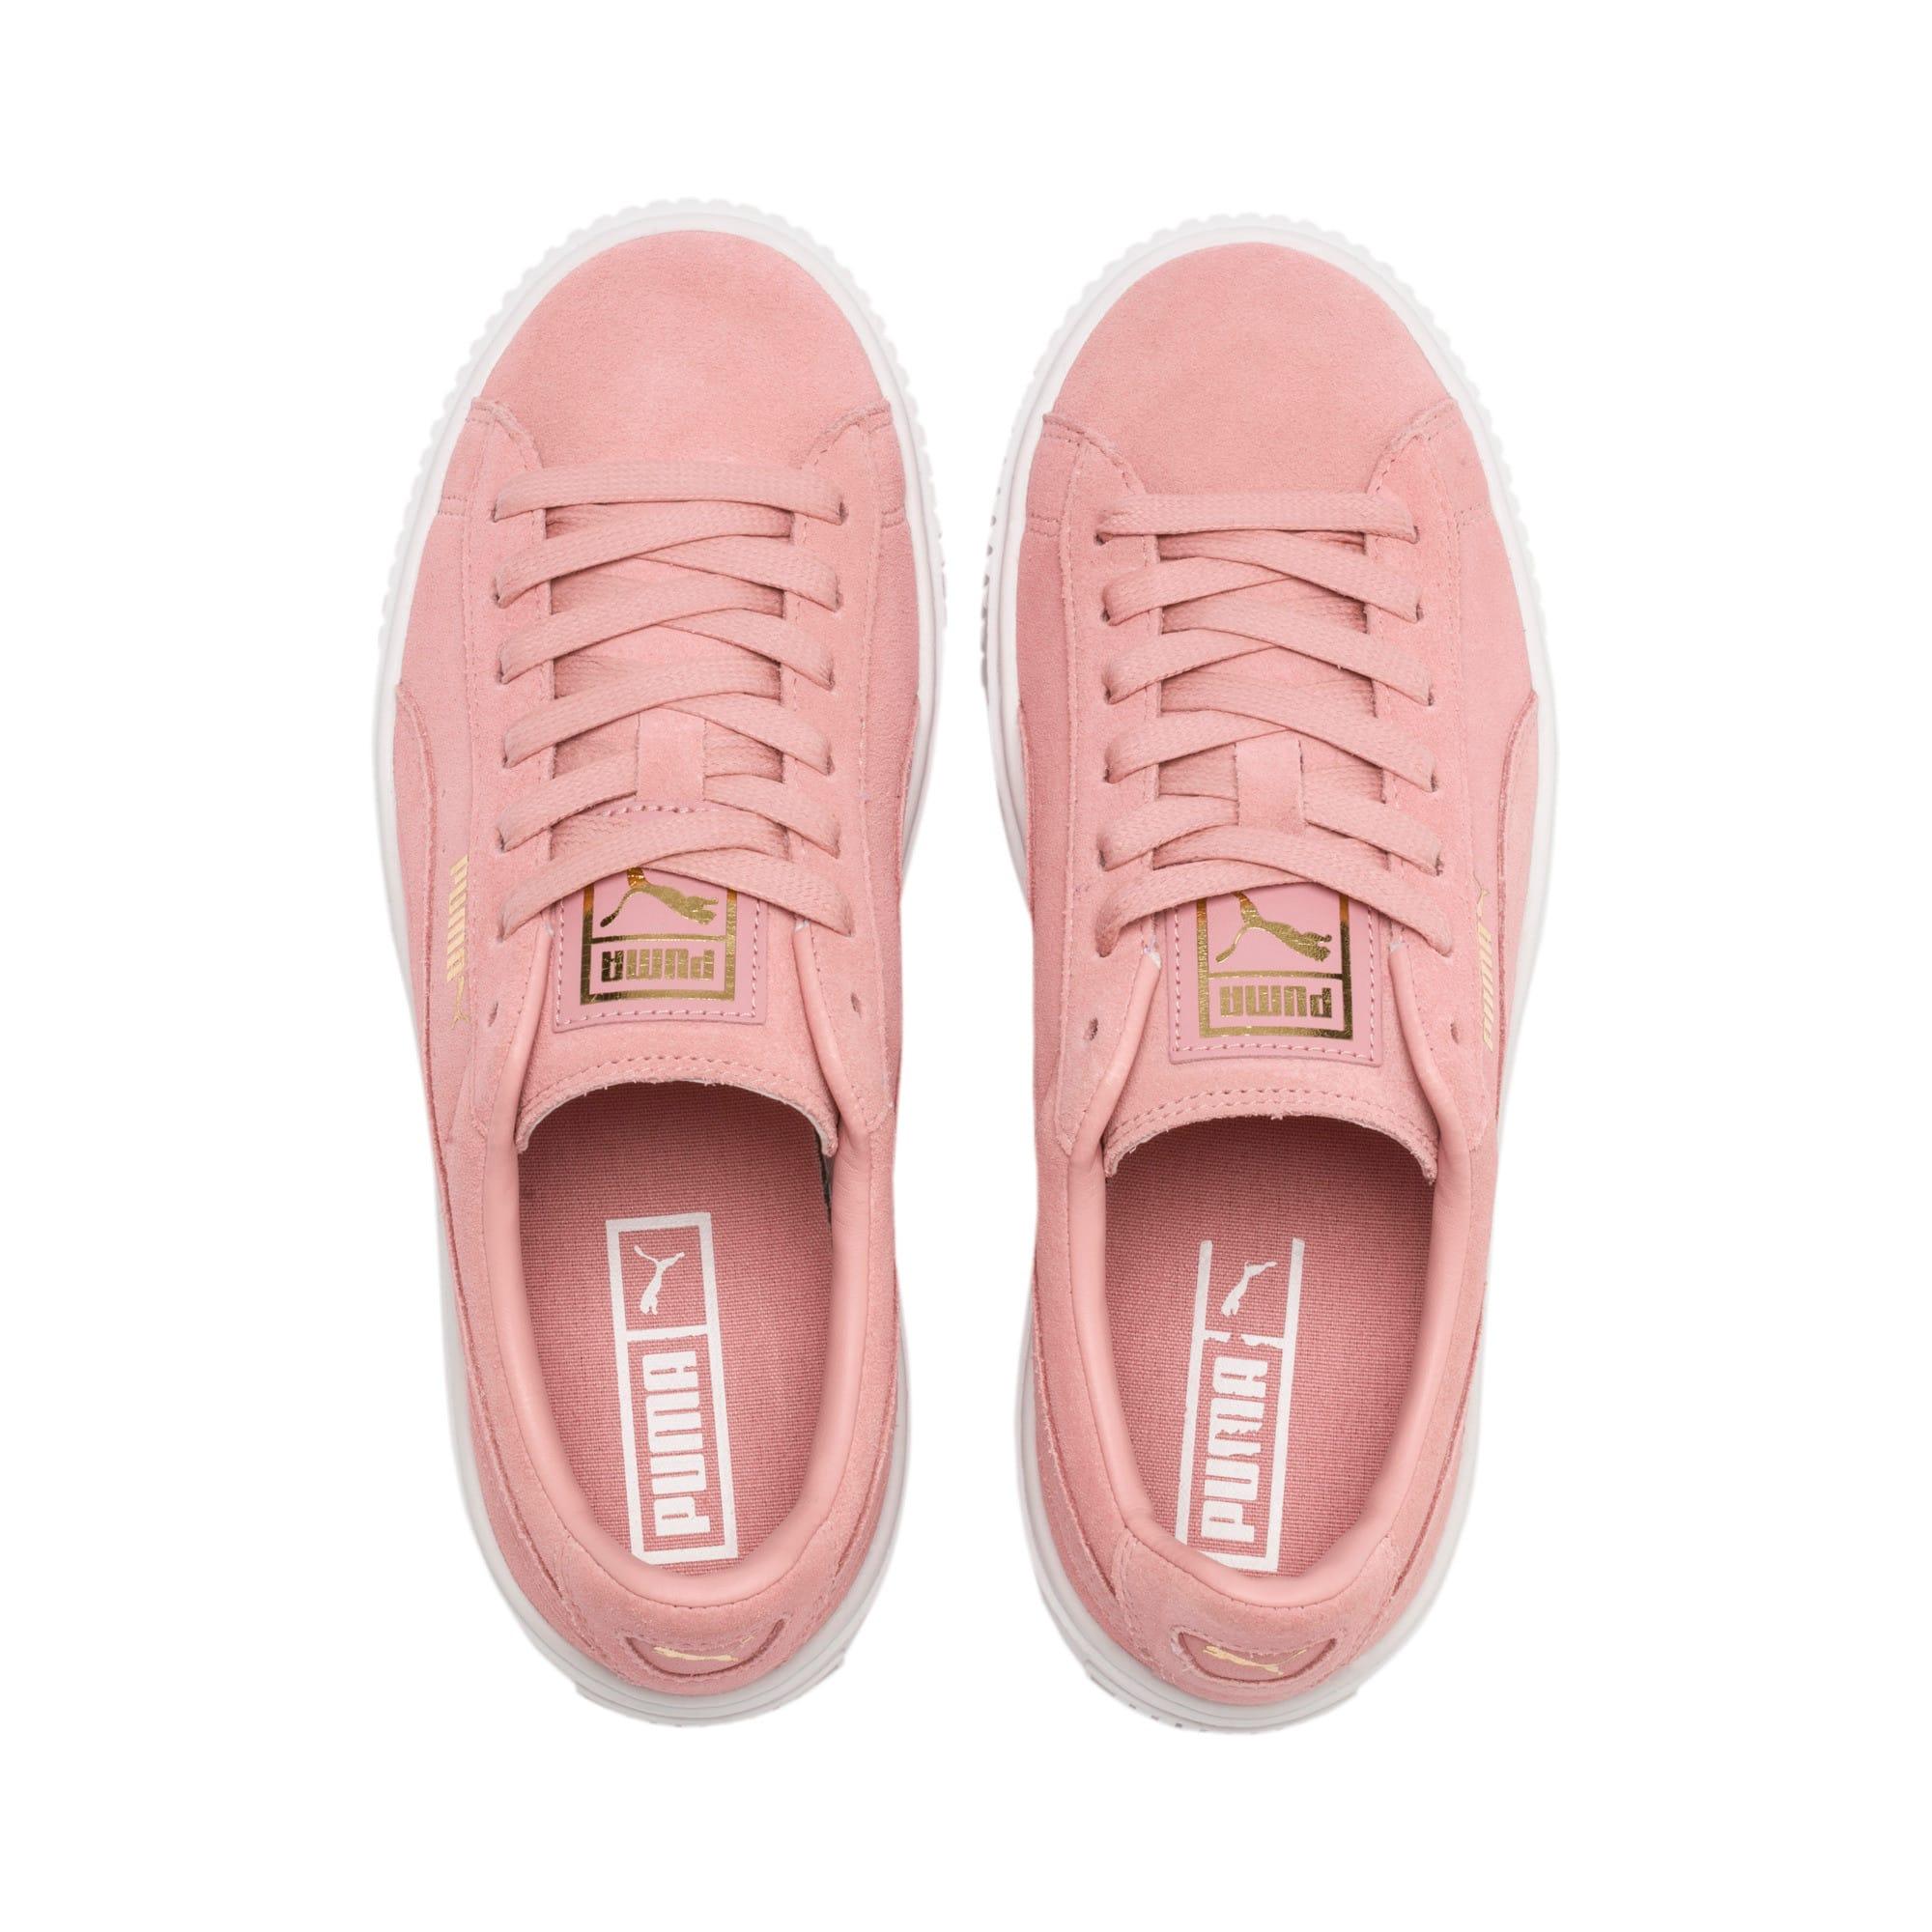 Thumbnail 7 of Suede Platform Women's Sneakers, Bridal Rose-Puma Team Gold, medium